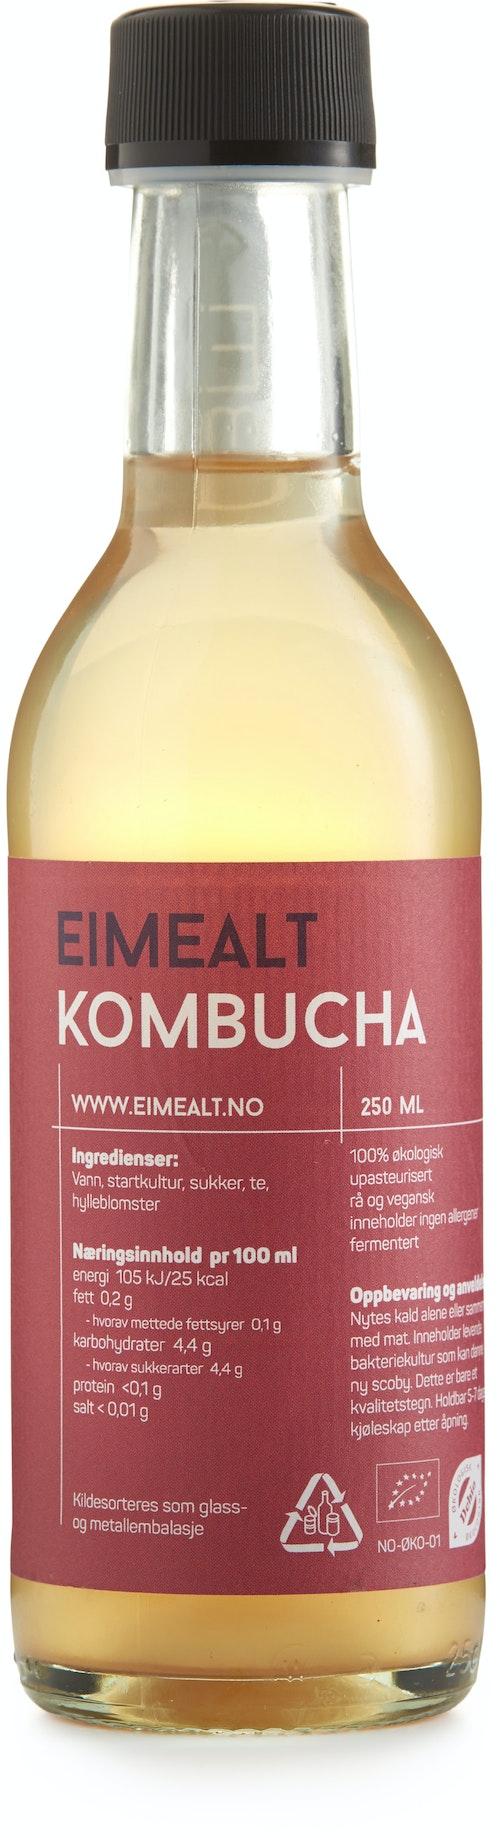 Eimealt Kombucha Hylleblomst 250 ml